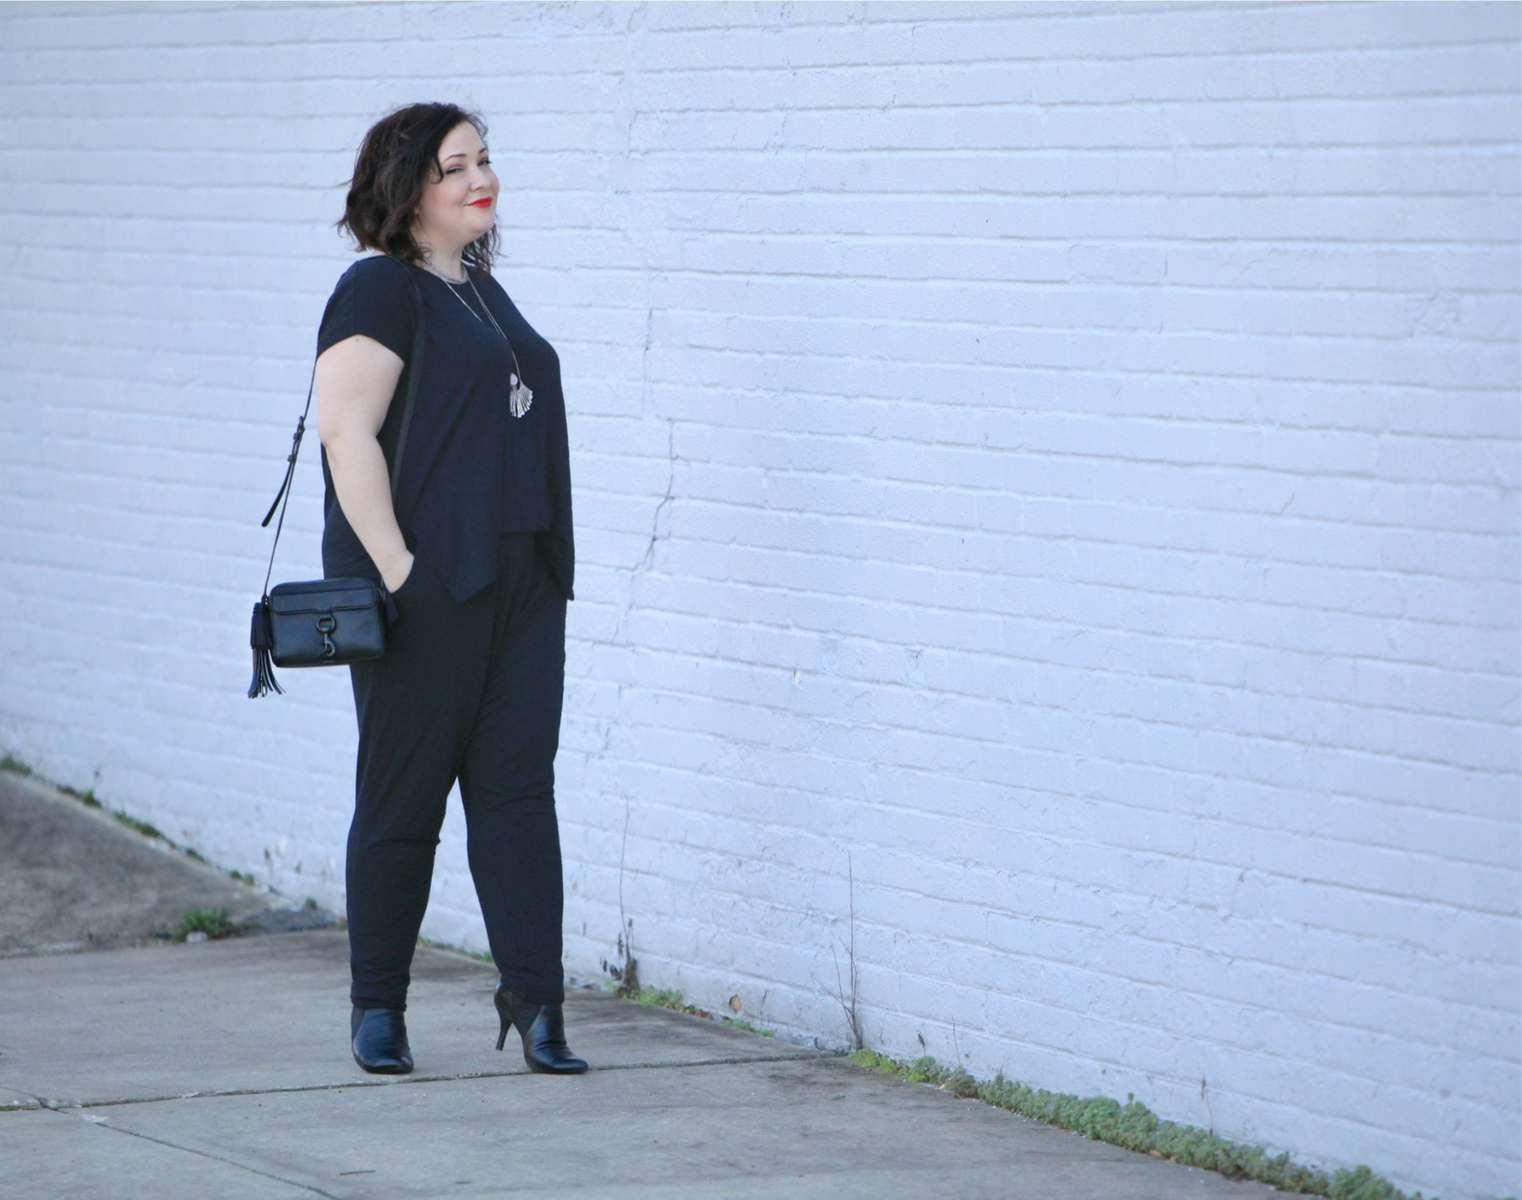 wardrobe oxygen over 40 fashion blogger in cabi